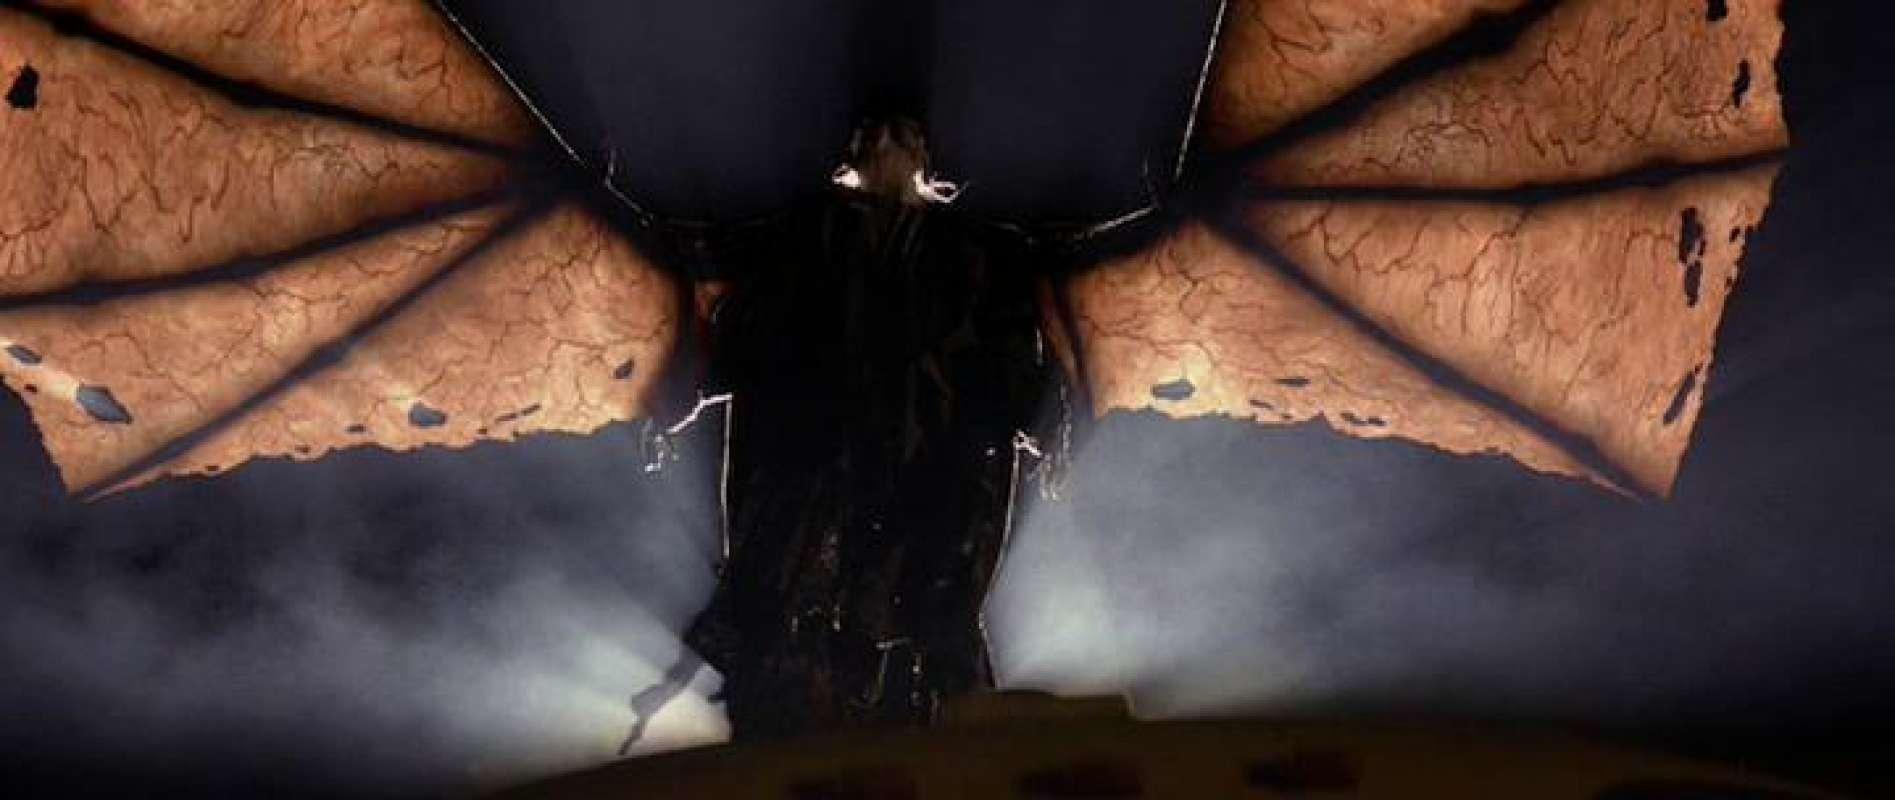 Невероятное видео из США: В Иллинойсе на фоне фонаря пролетело нечто неприятное